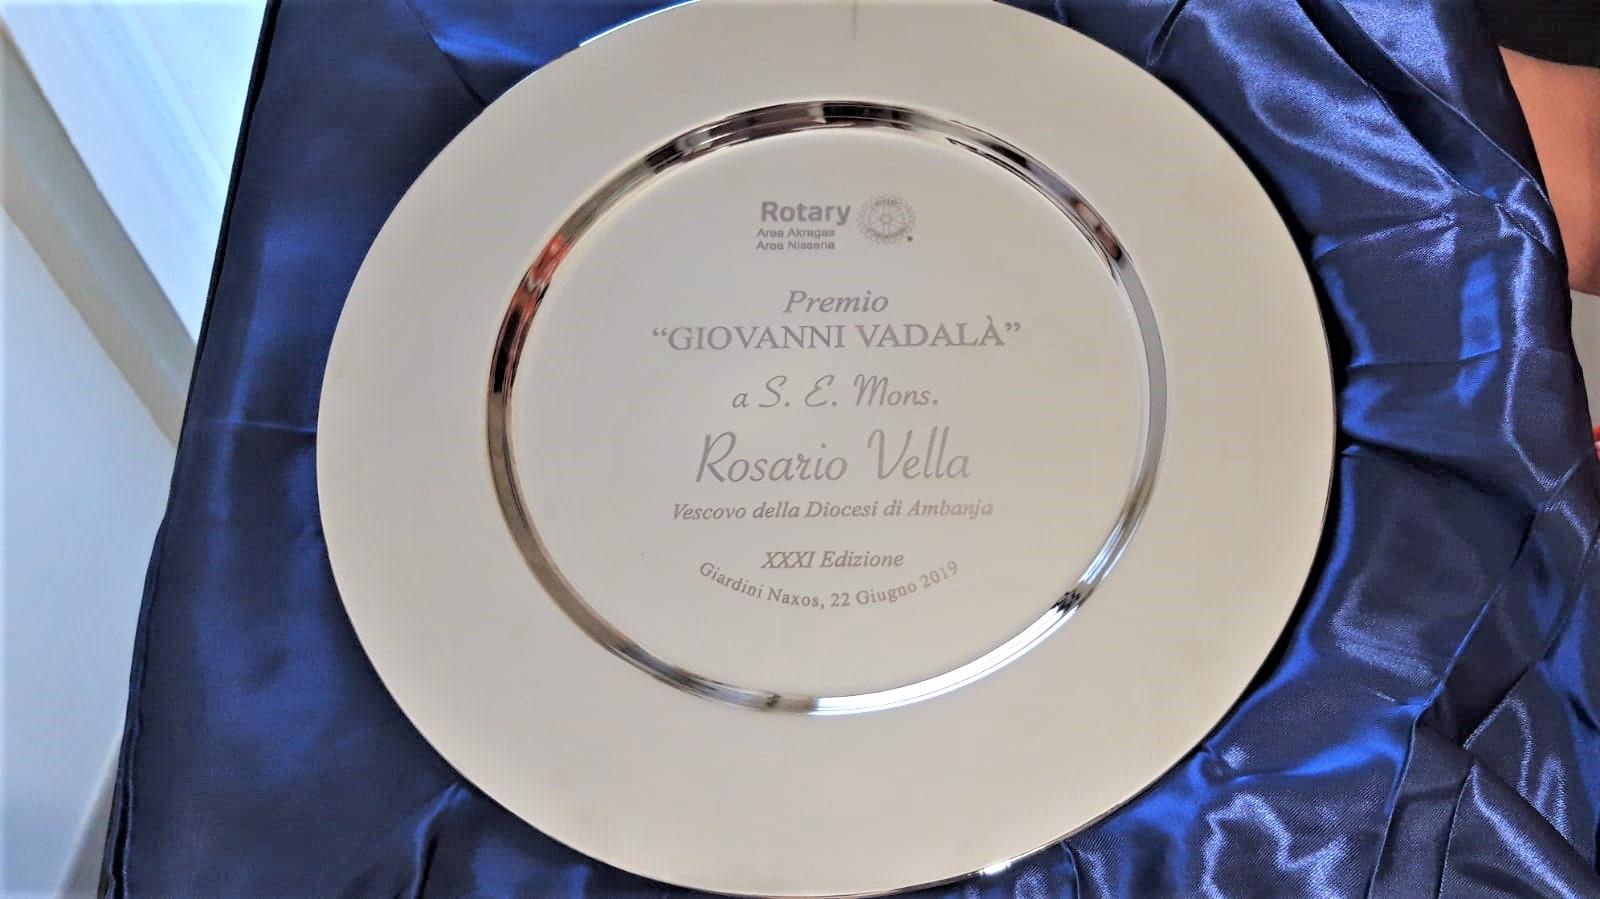 Premio-Vadalà-2019-16